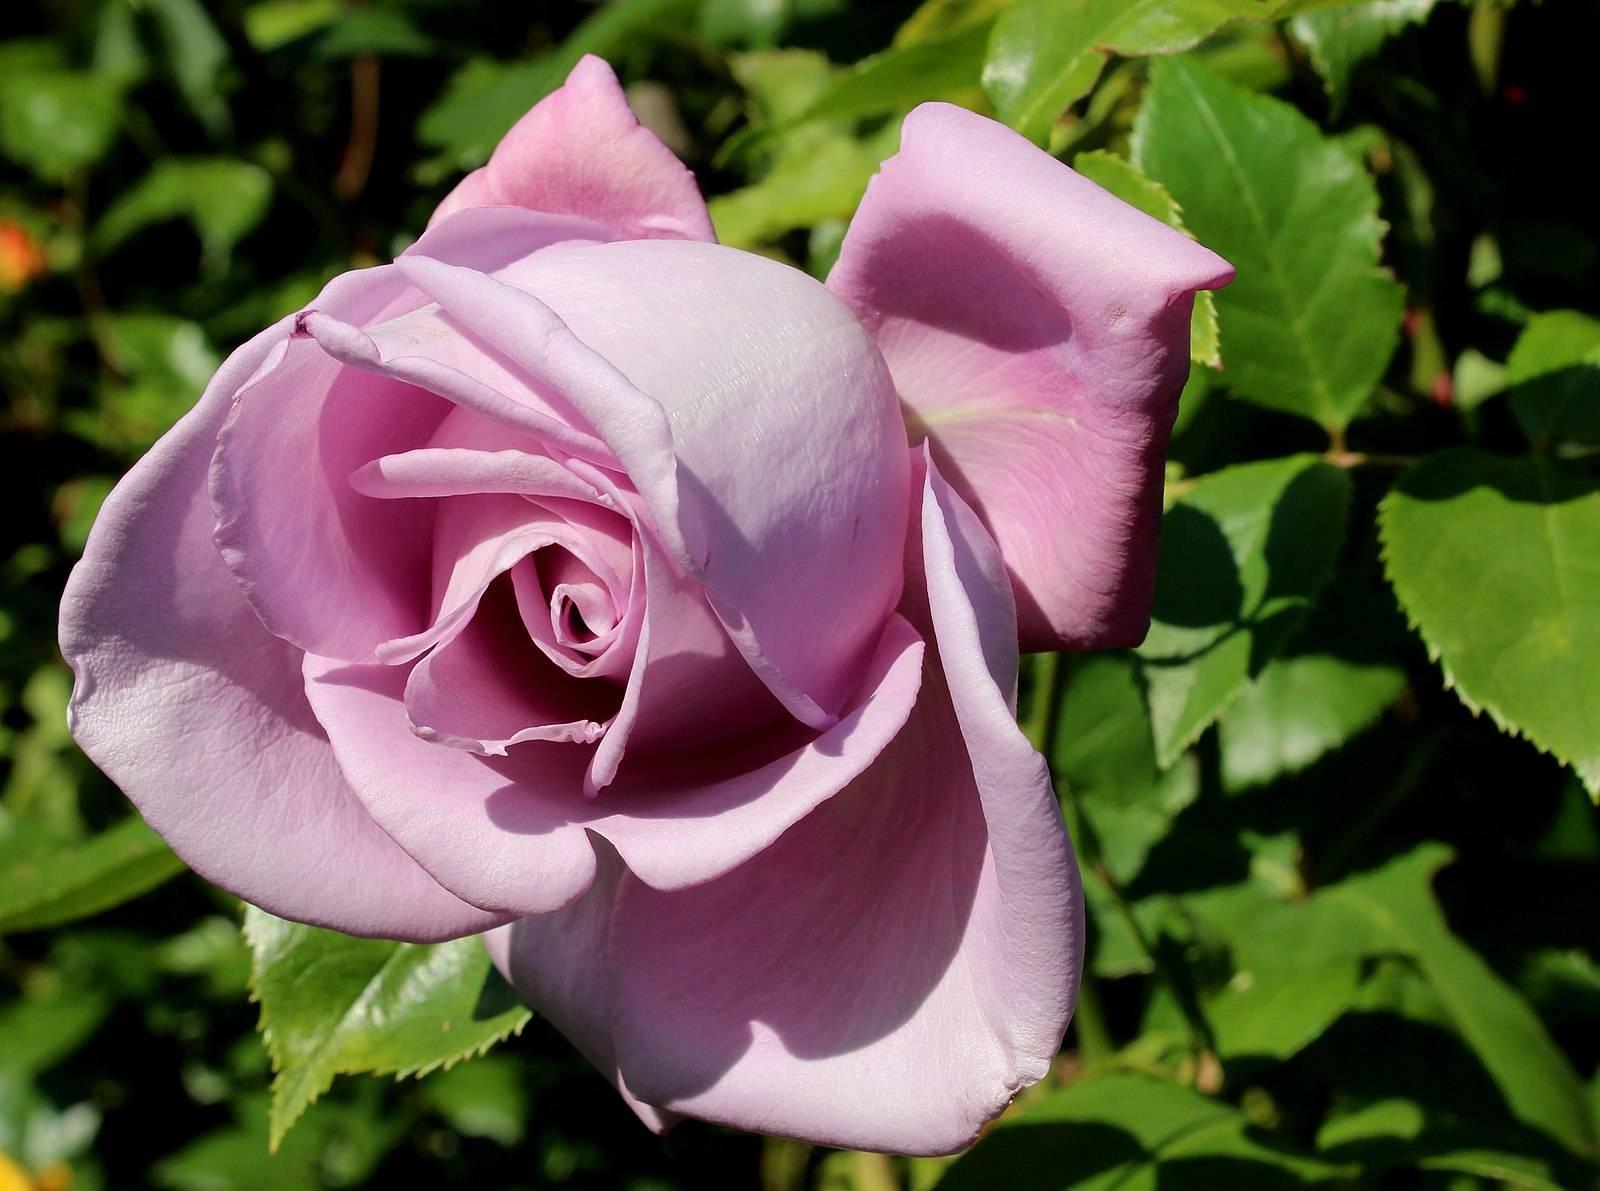 Саженцы роз майнцер фастнахт mainzer fastnacht